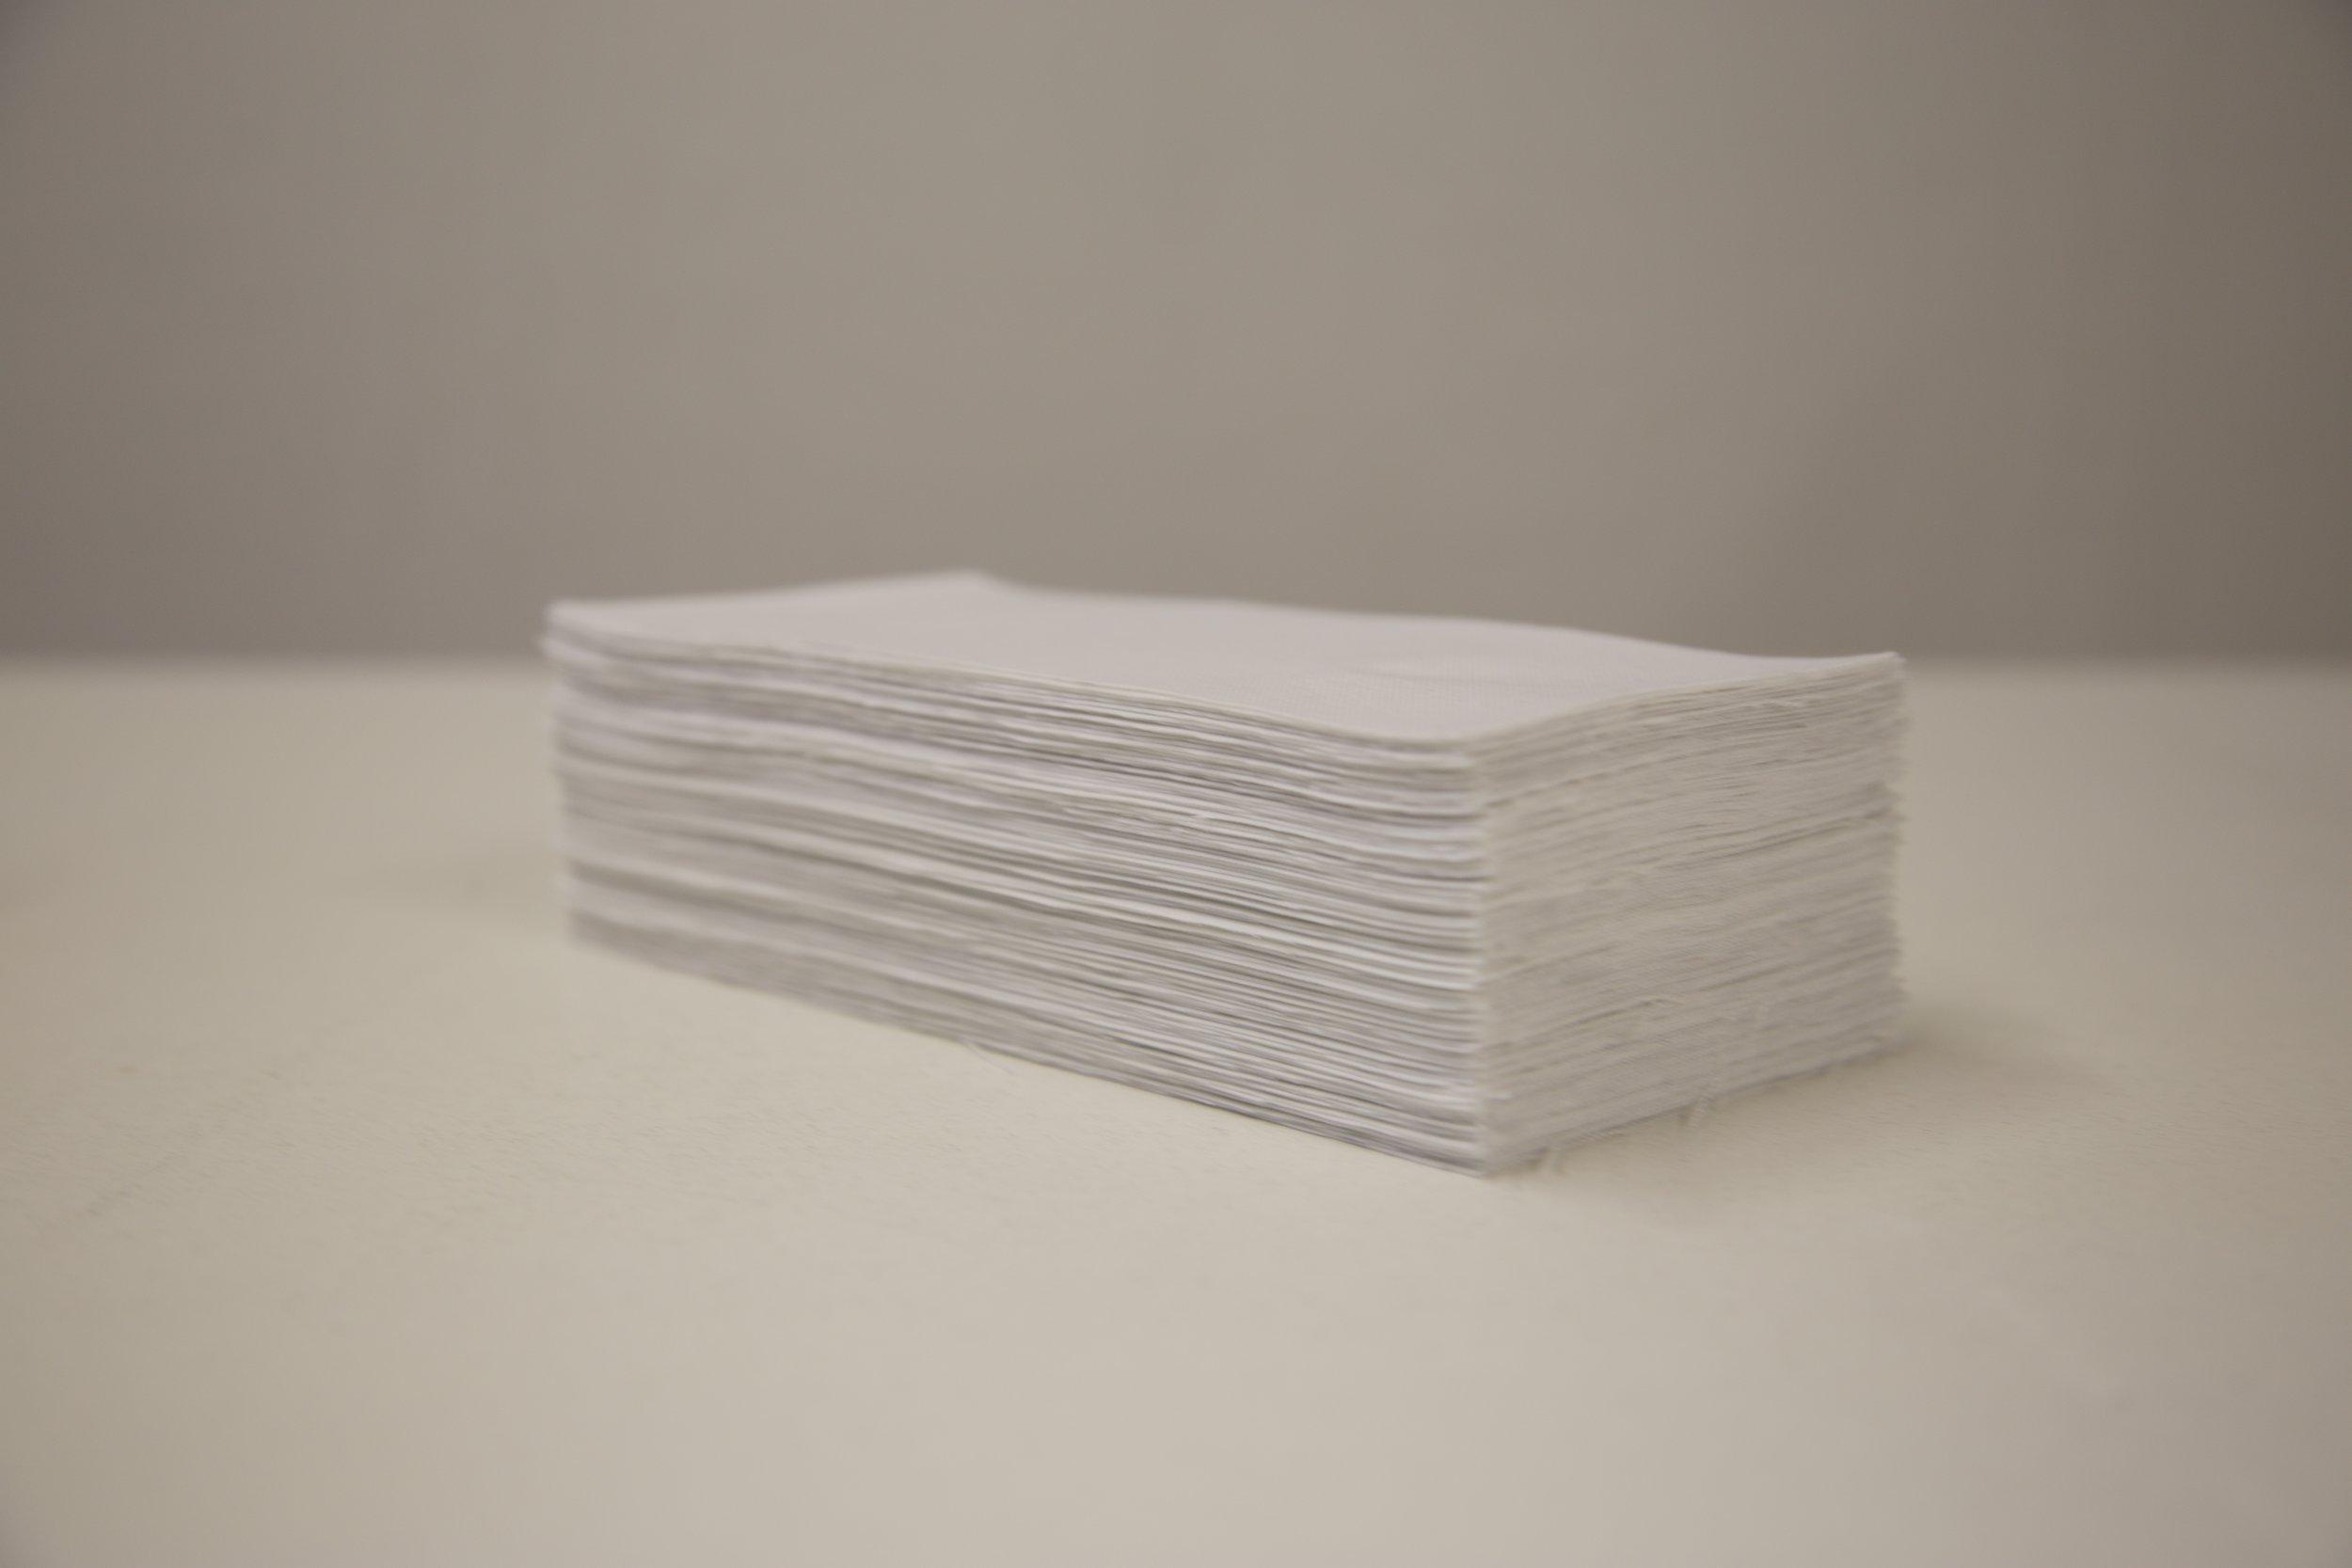 "cotton,3 1/2"" x 2 1/4"" x 8"", 2017"